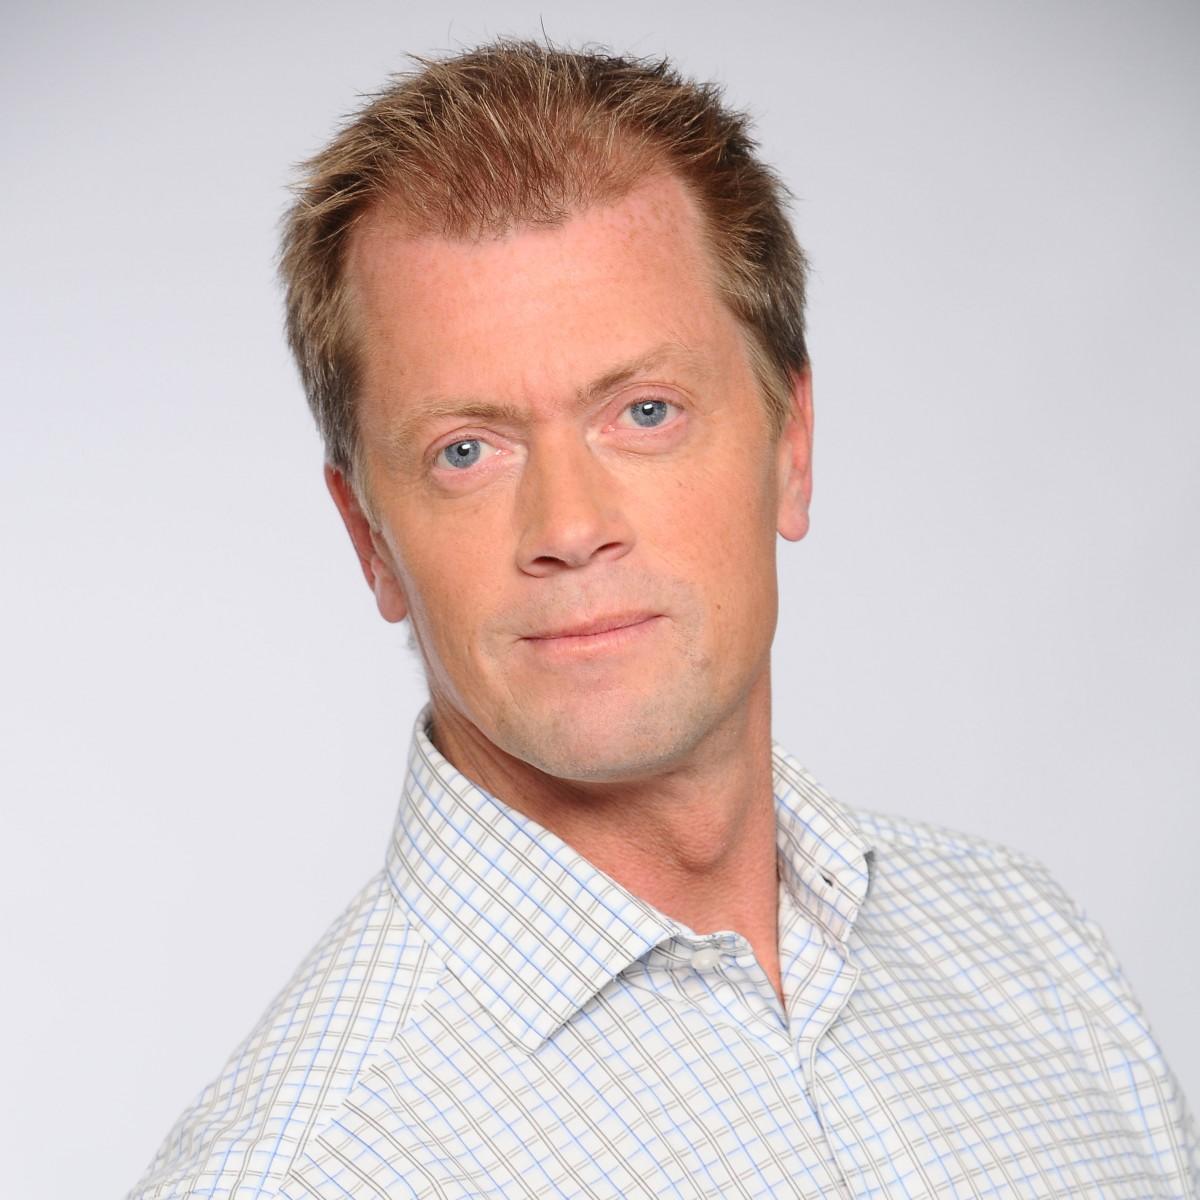 Johan Markholm